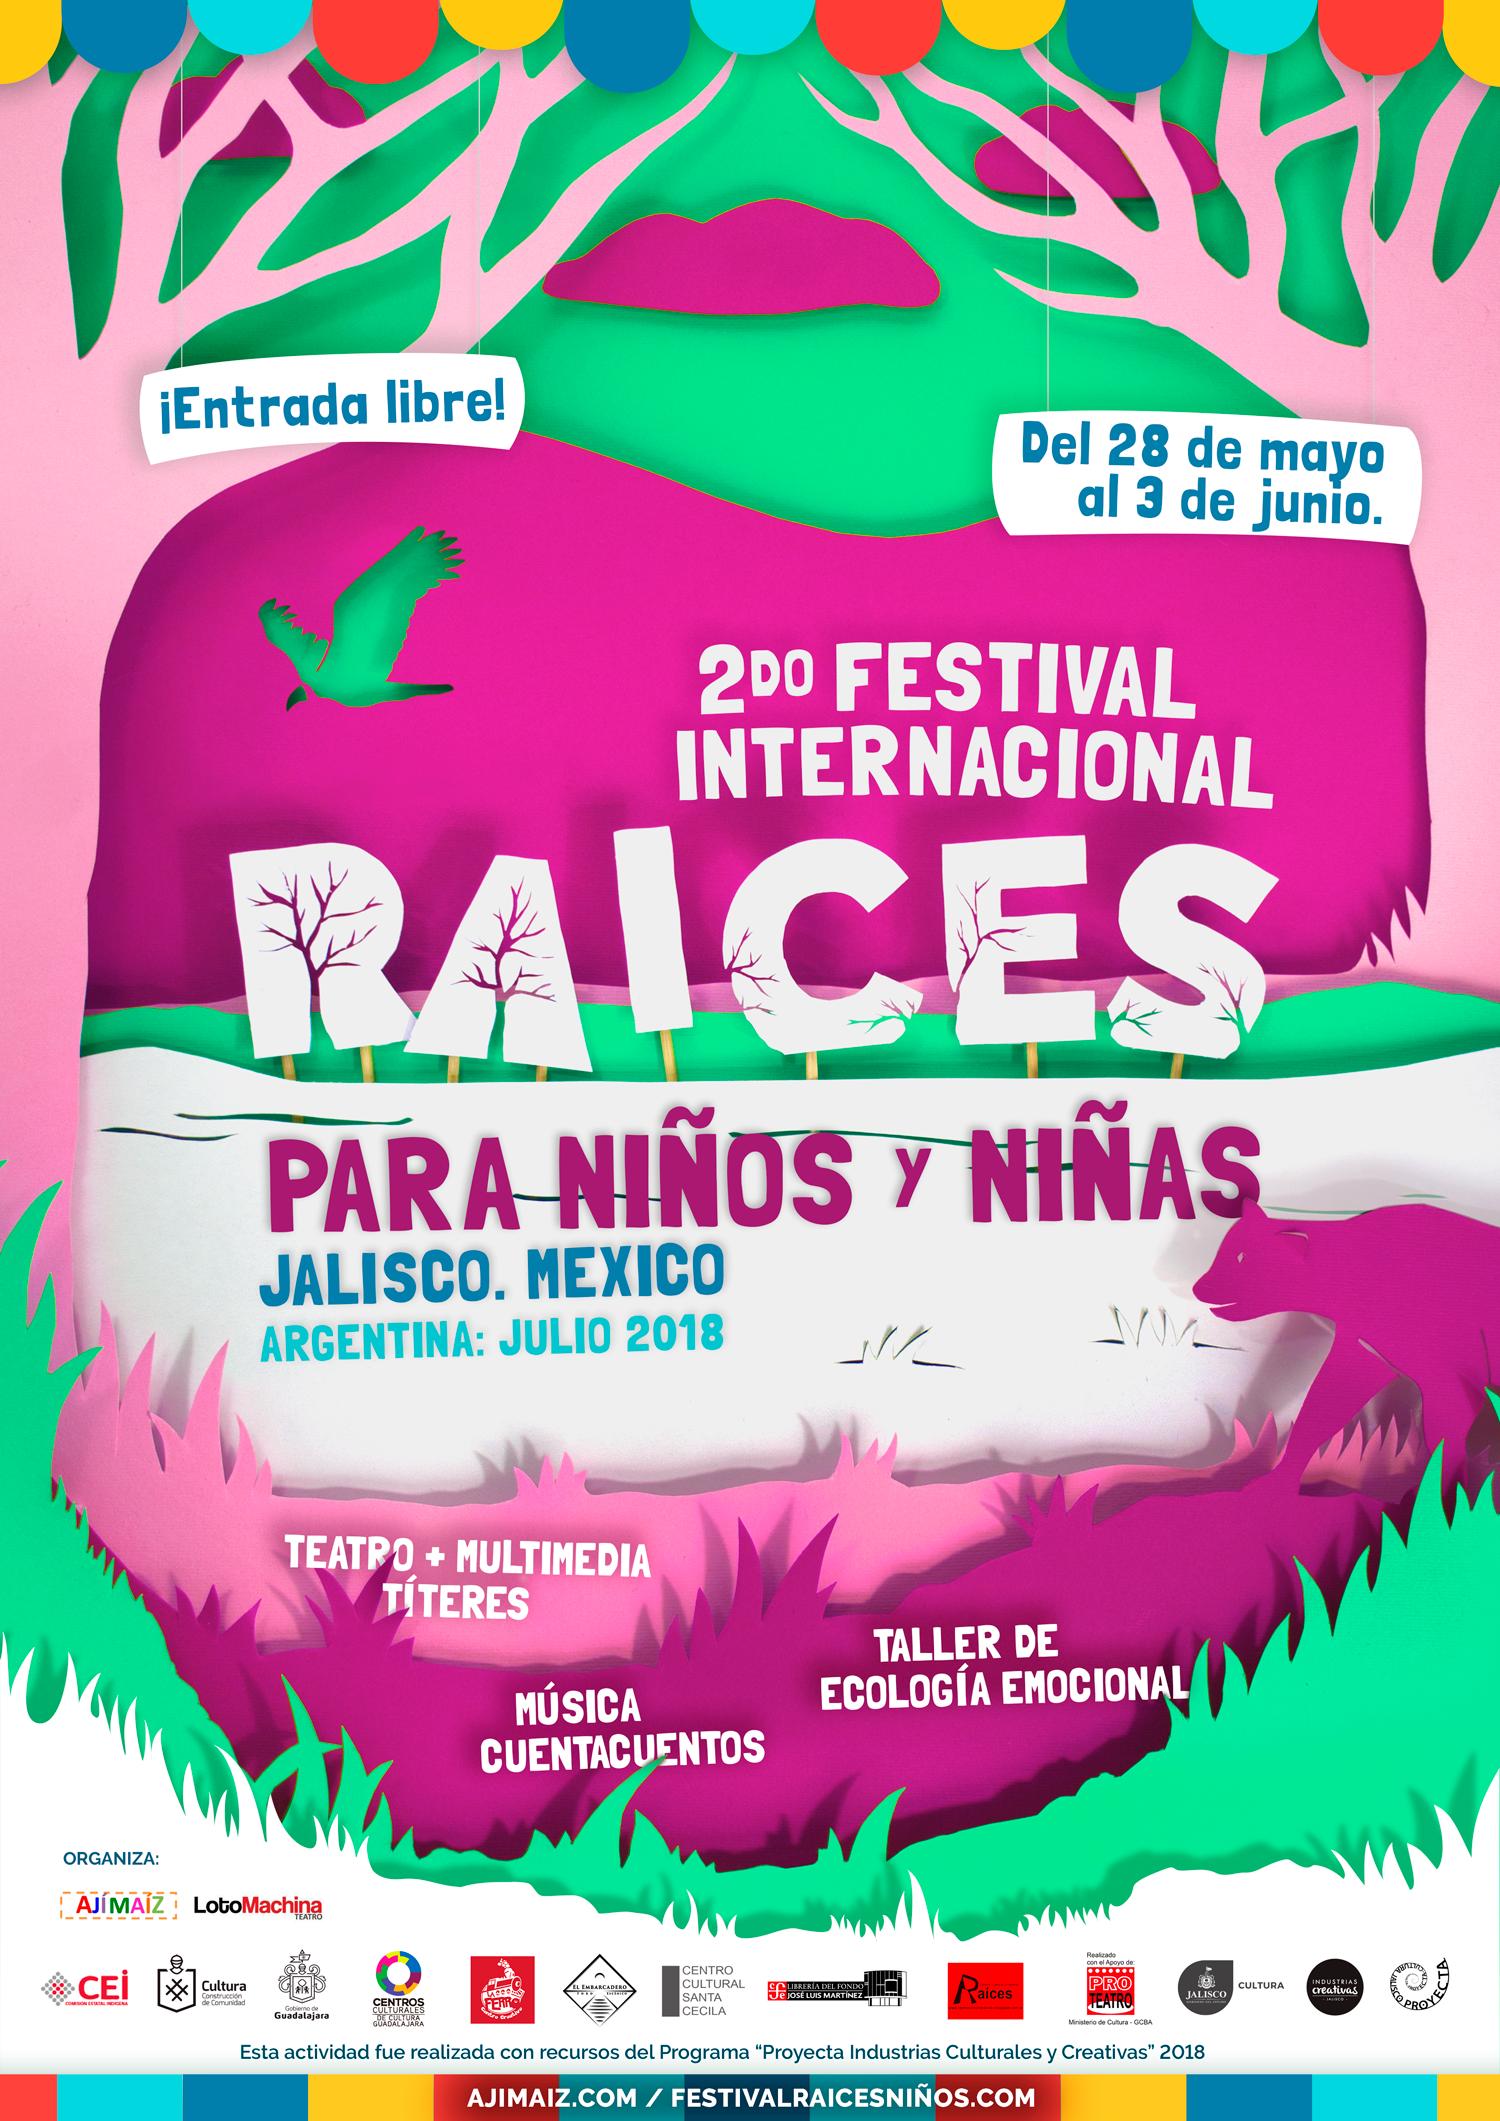 Afiche-Raíces-2018-Mexico_para-redes